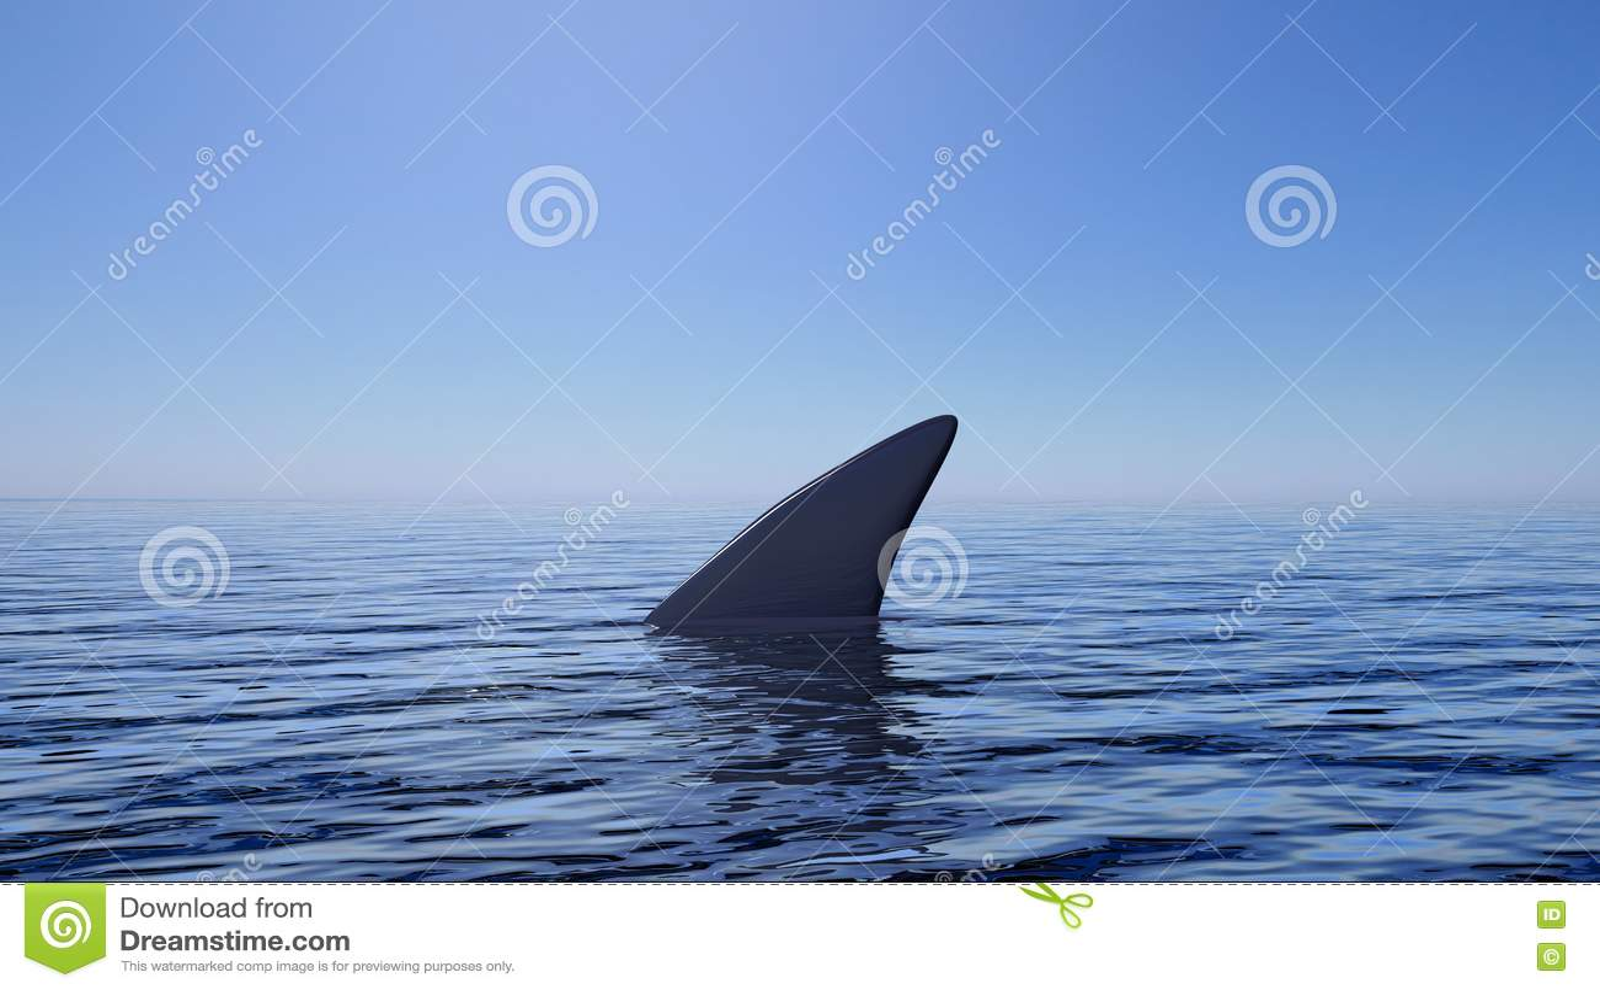 shark fin white background - photo #15